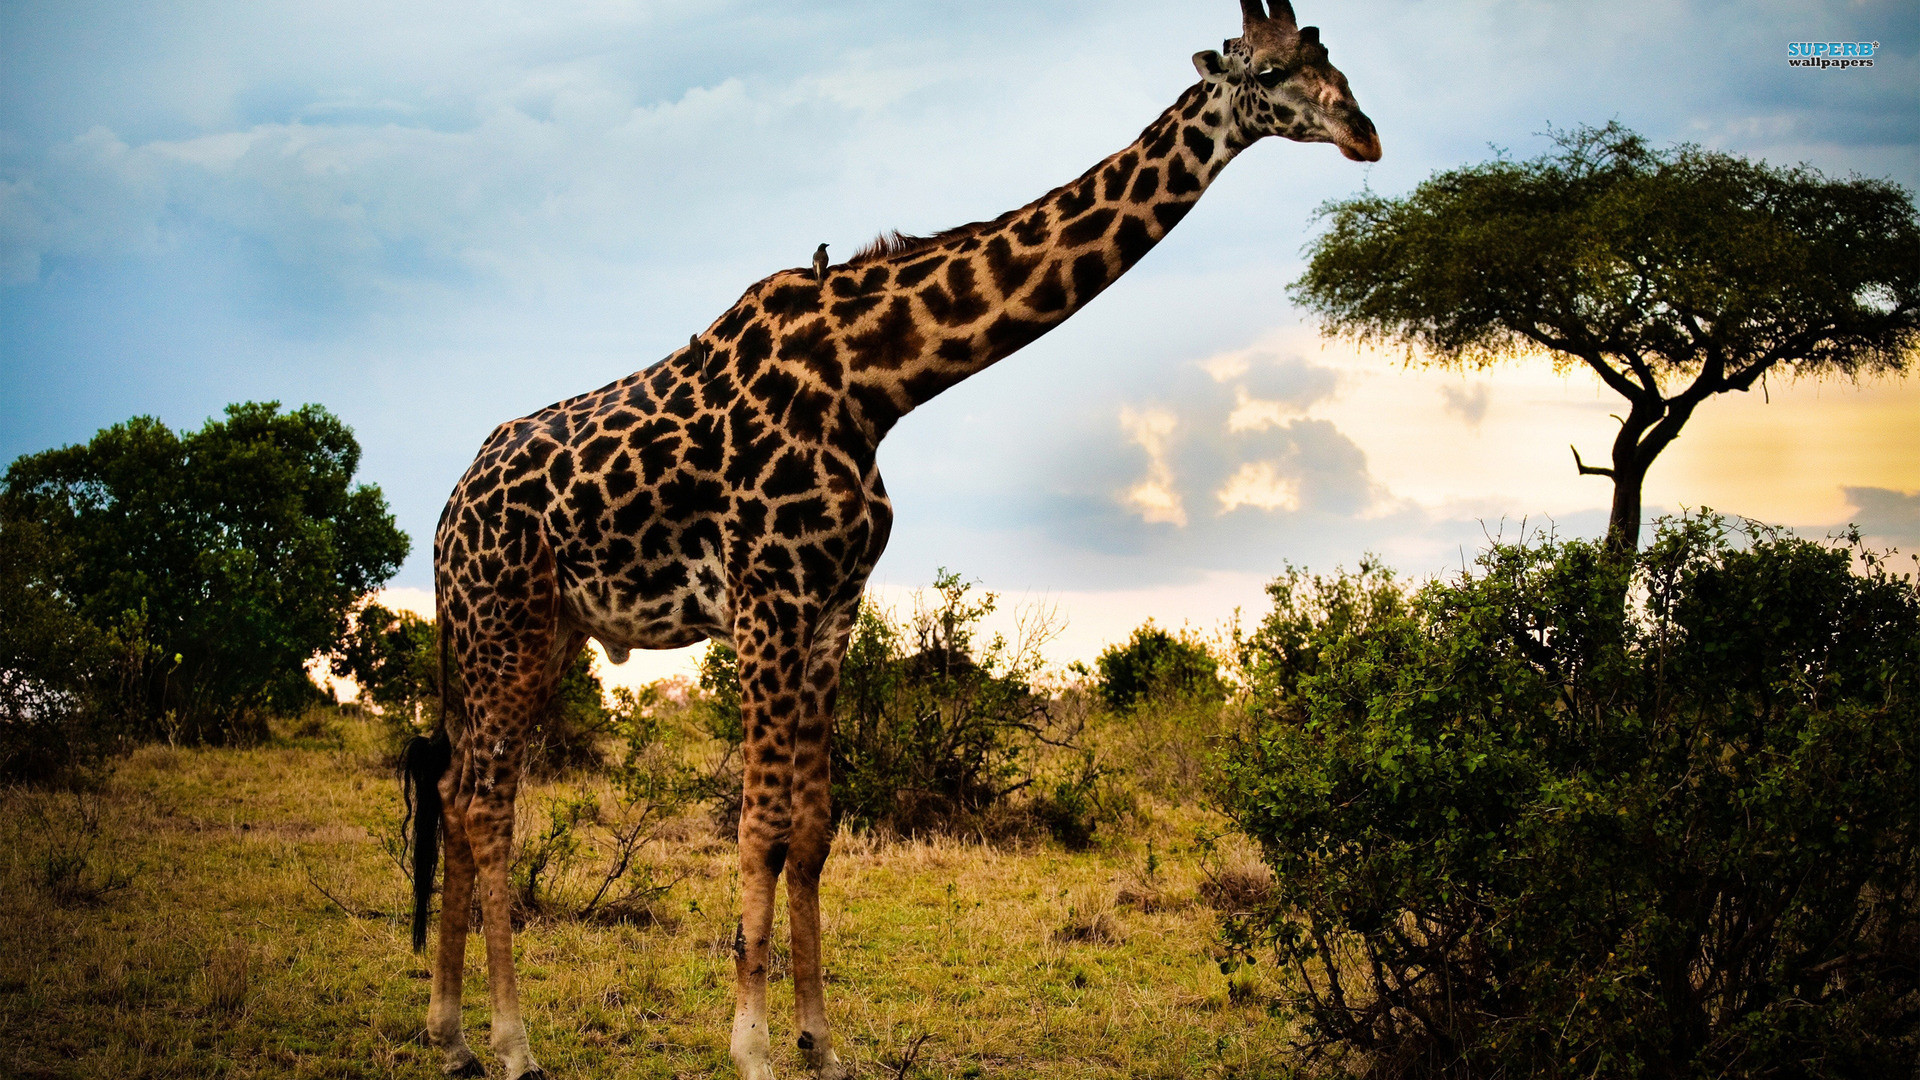 Cute giraffe wallpaper tumblr – photo#19